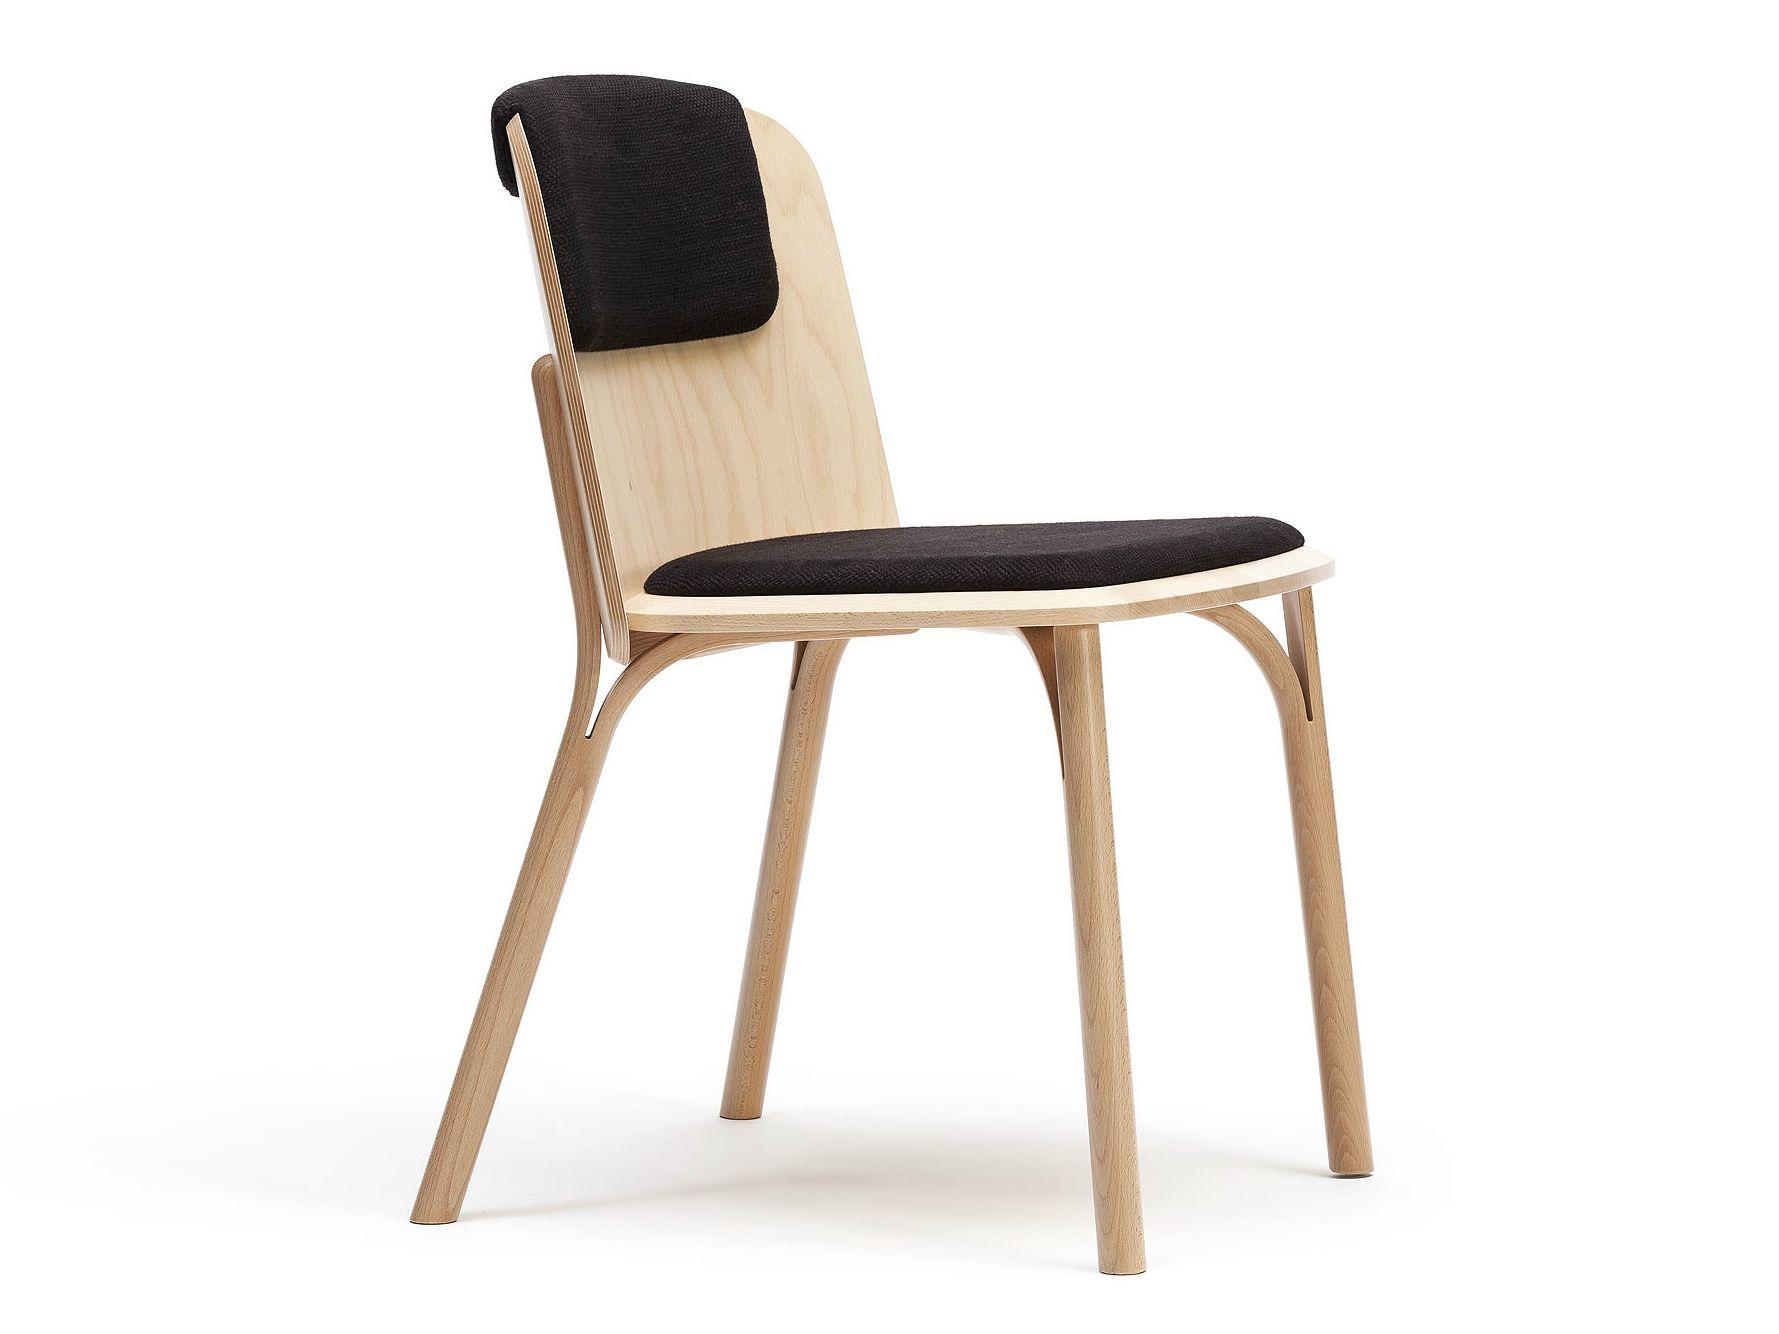 Split Gepolsterter Stuhl By Ton Design Arik Levy ダイニングチェア 椅子 チェア